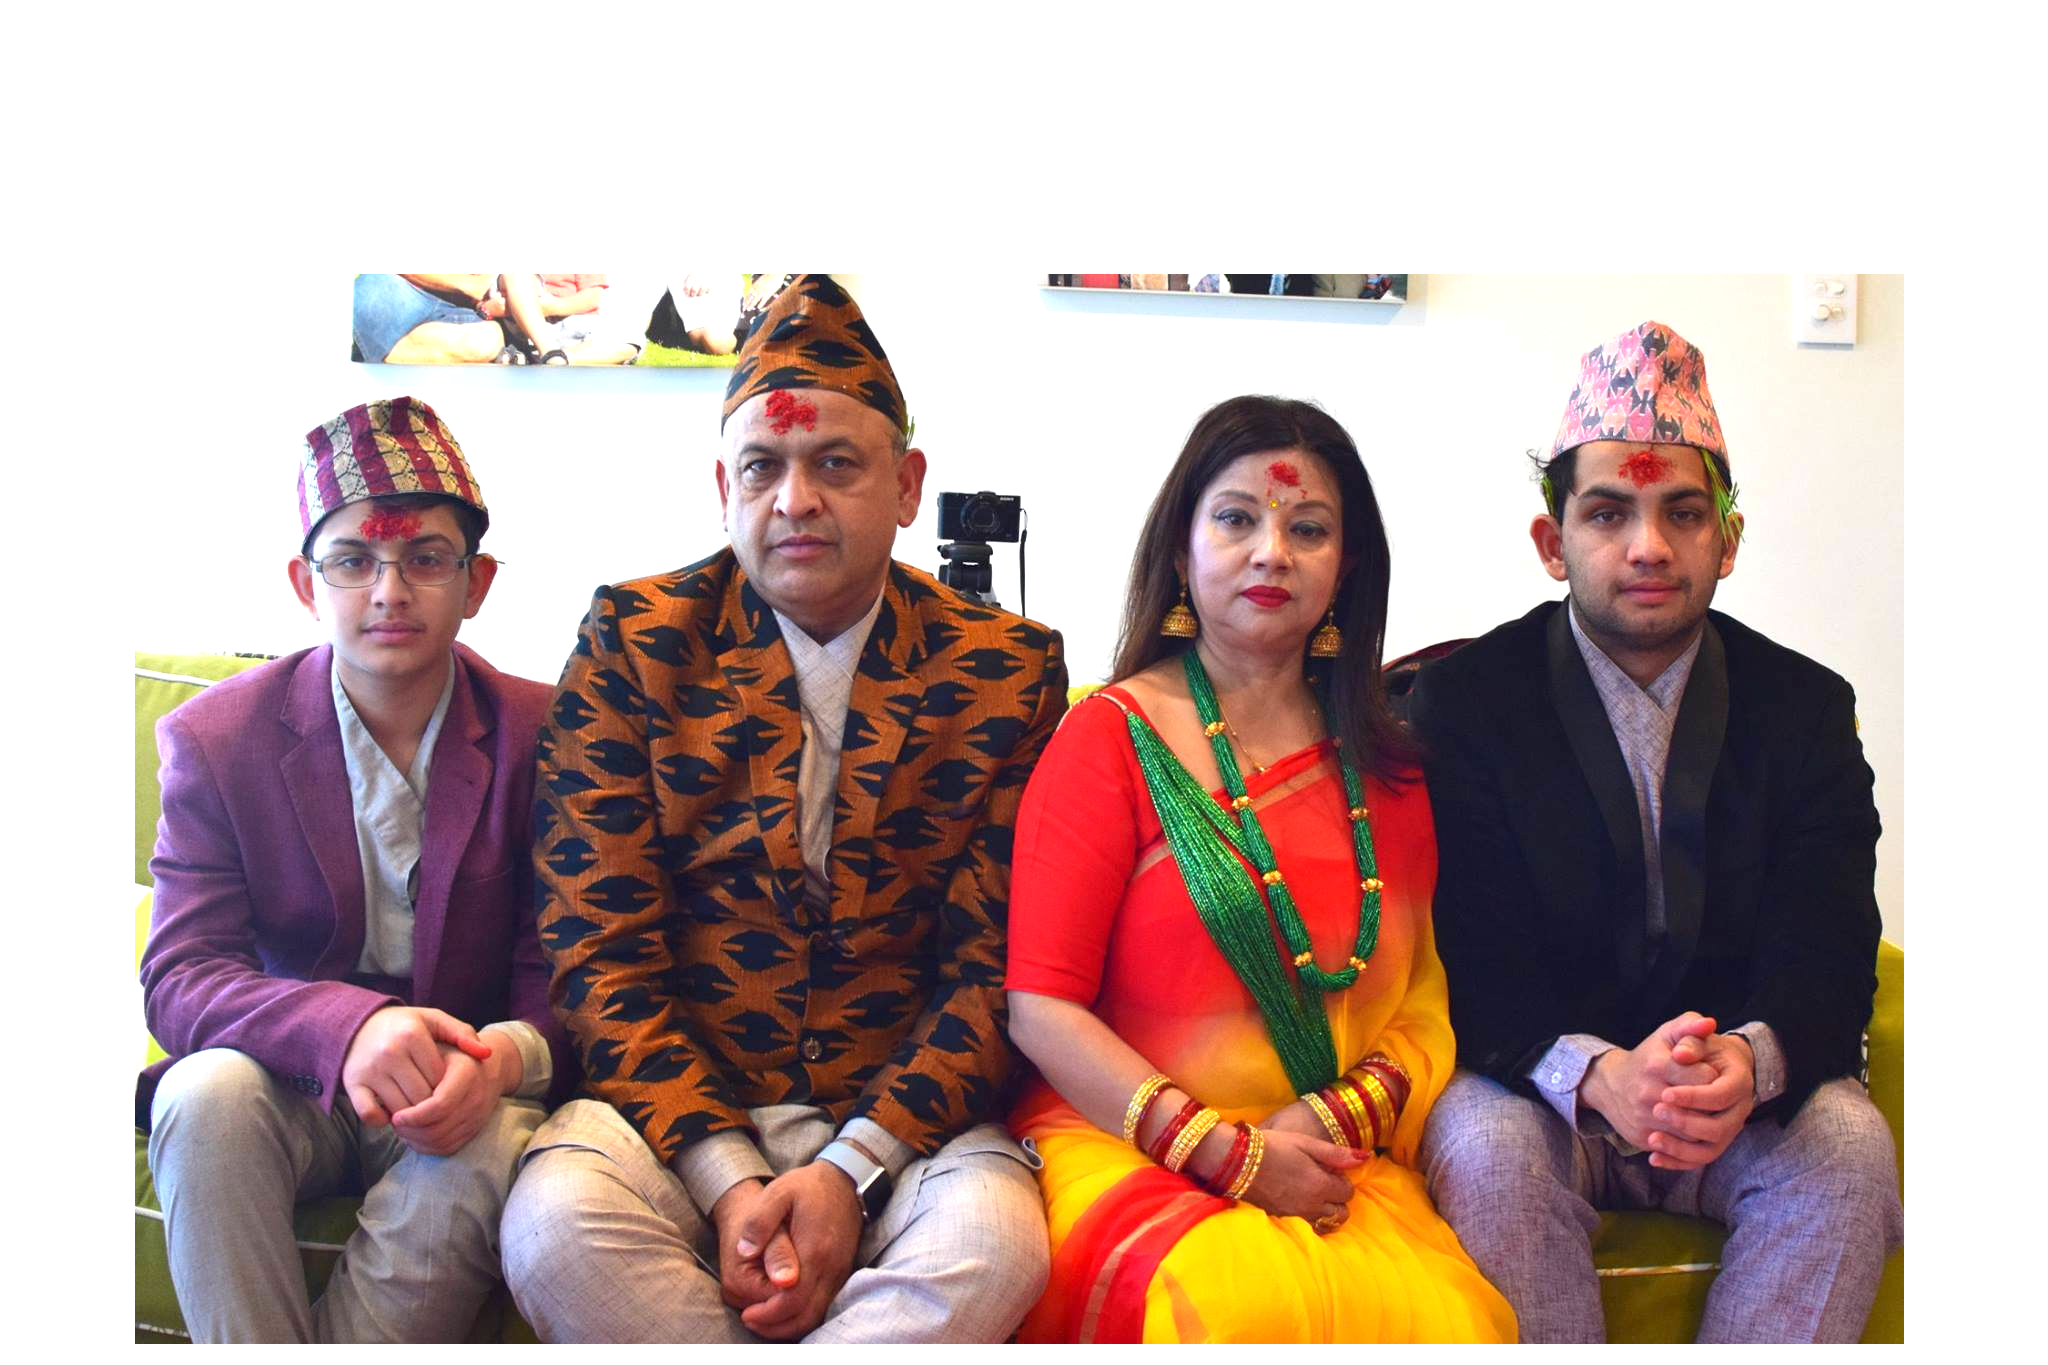 'Wish everyone in Aotearoa a healthy Dashain'